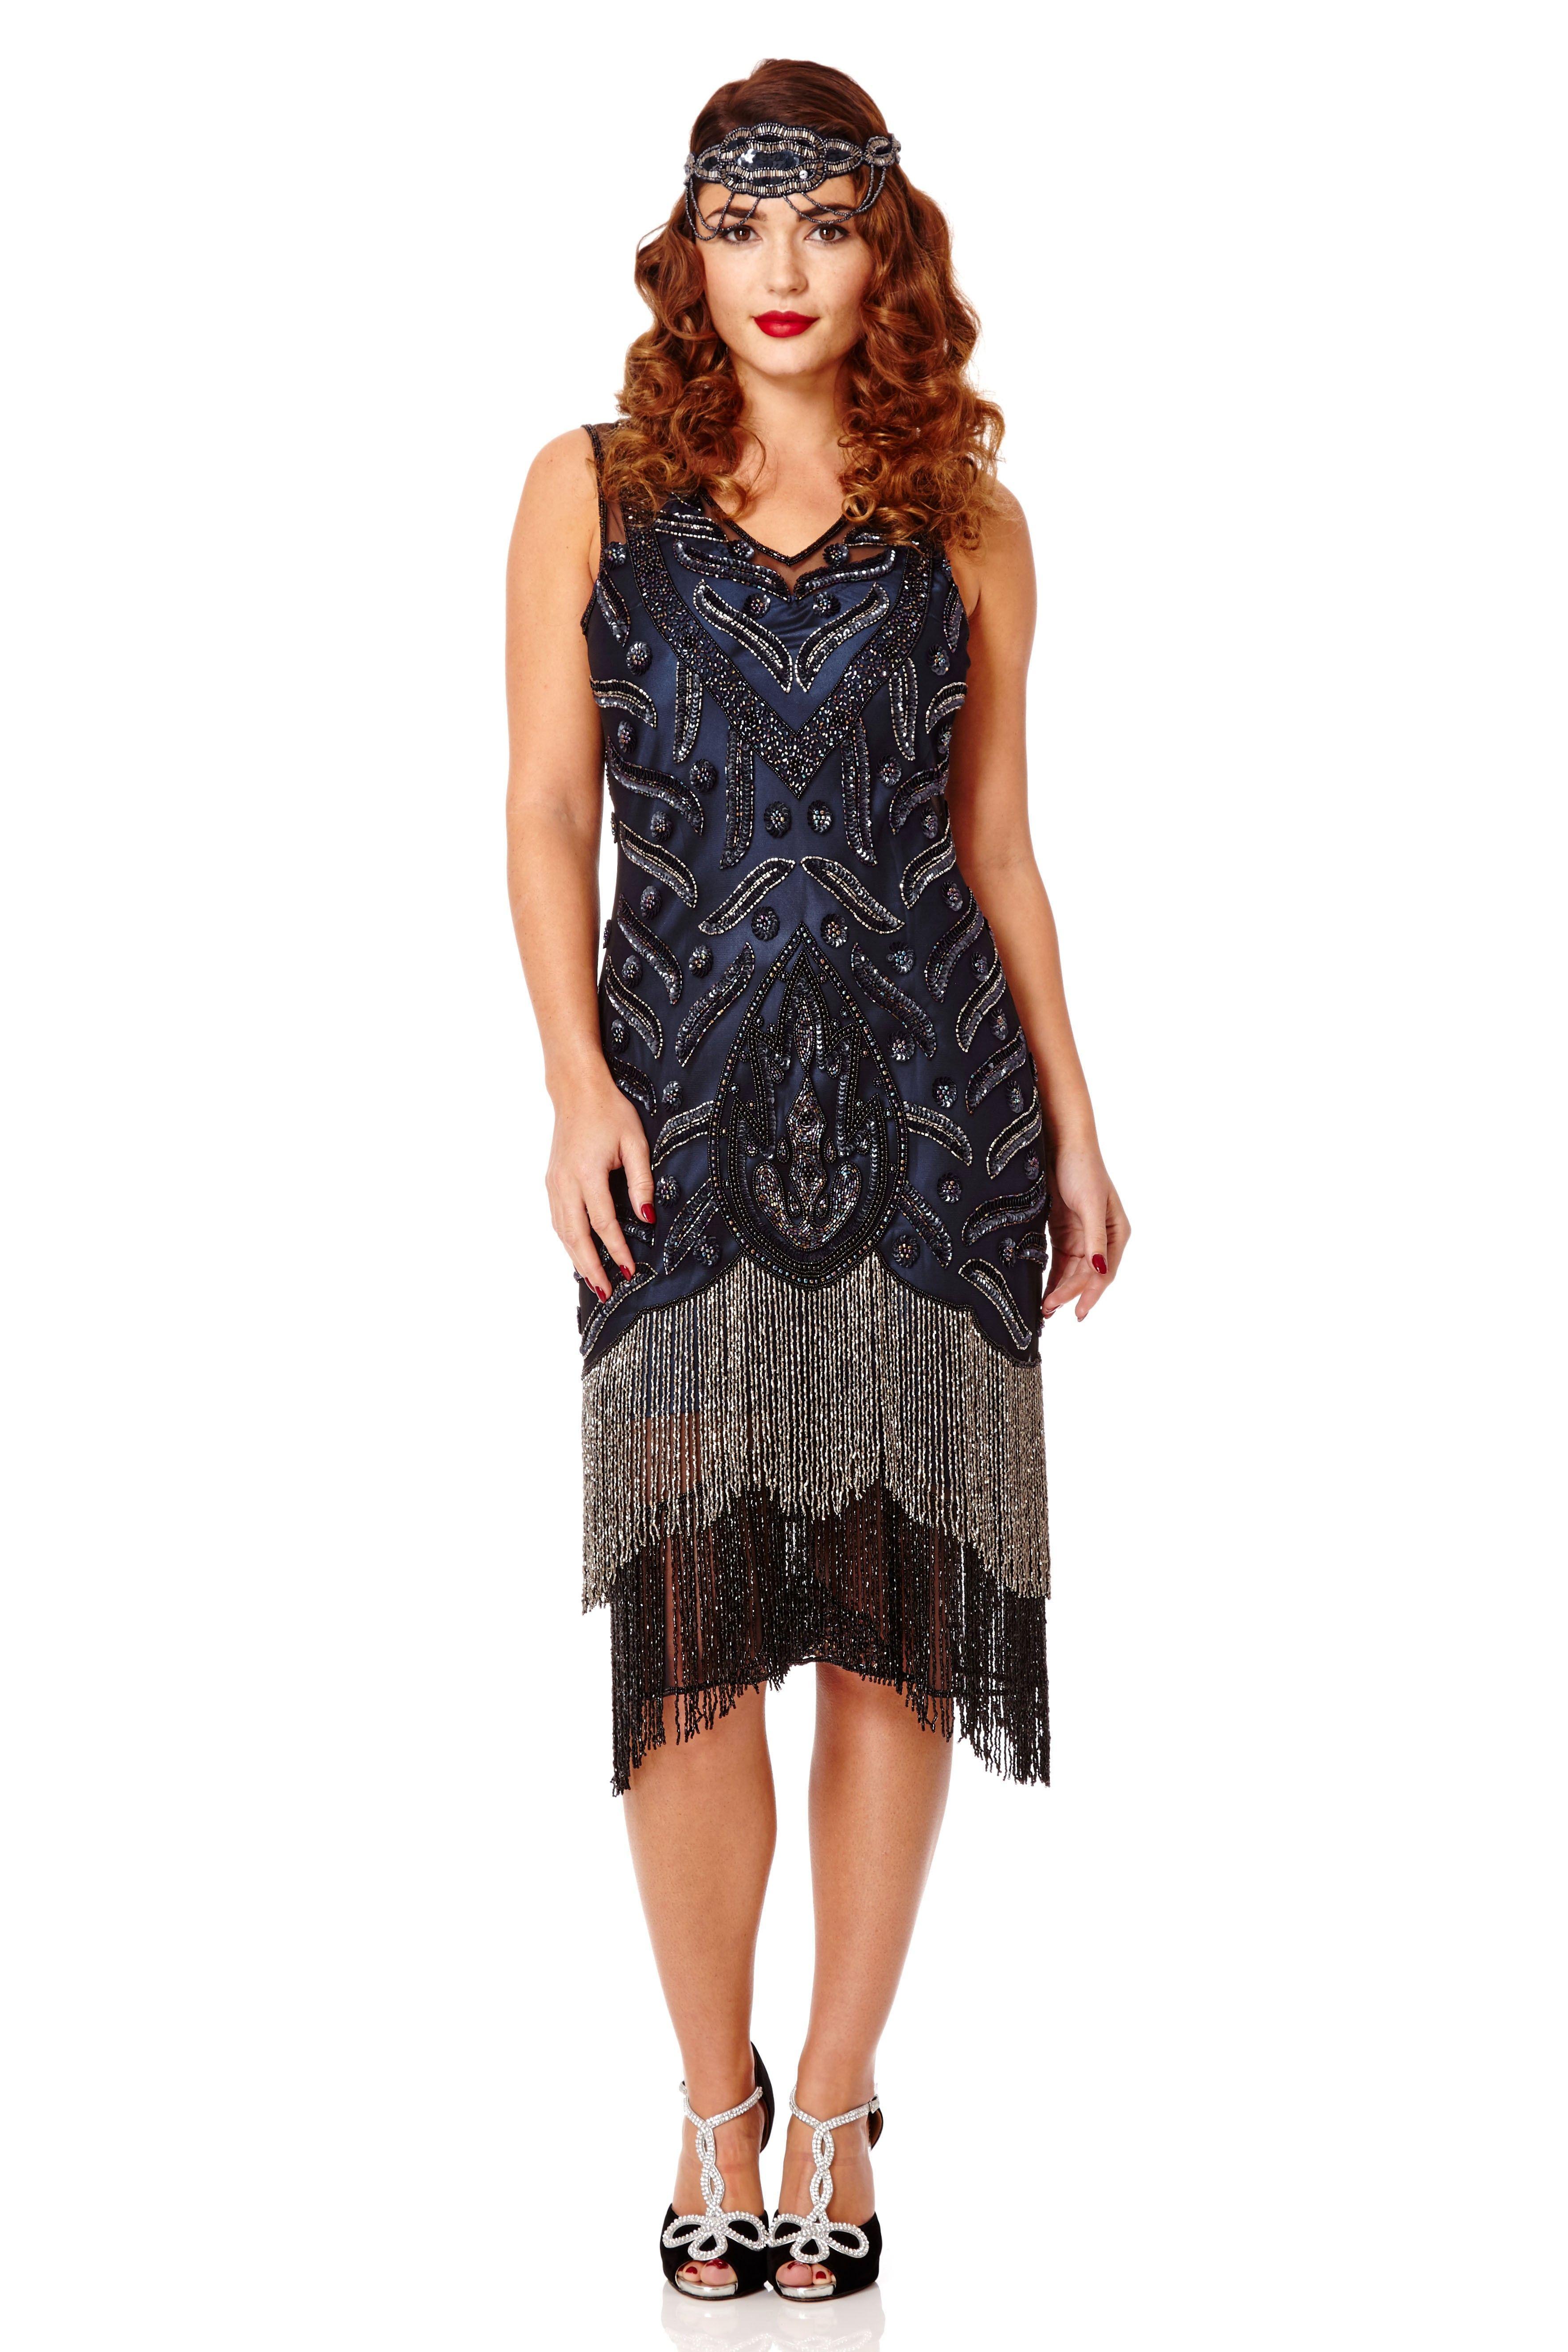 Gatsbylady hollywood 1920s vintage fringe dress slip